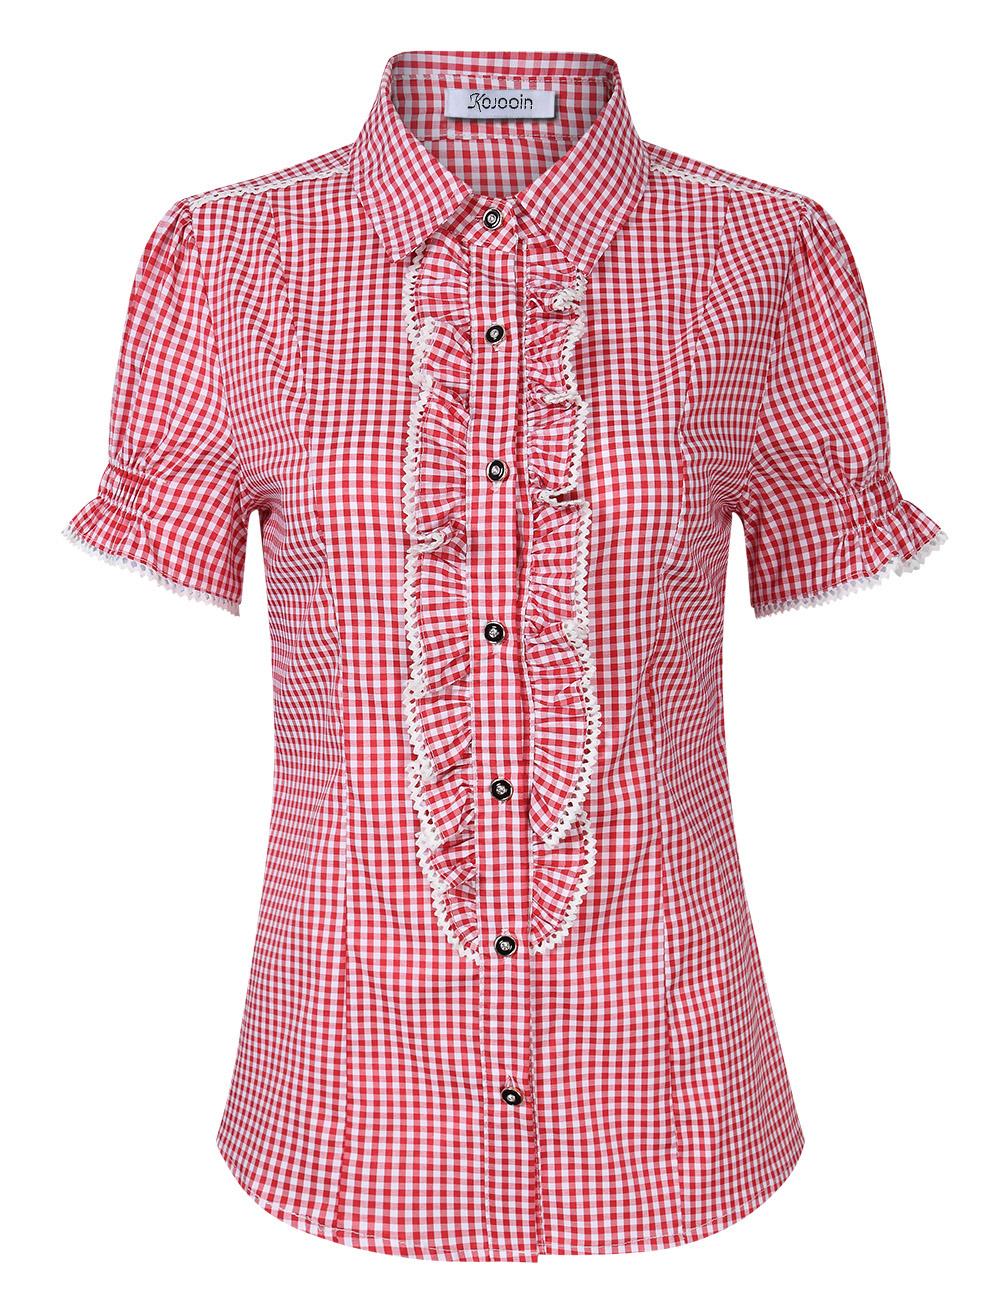 [EU Direct] Women's Beer Festival Plaid Pleated Short Sleeve Casual Shirt for Oktoberfest